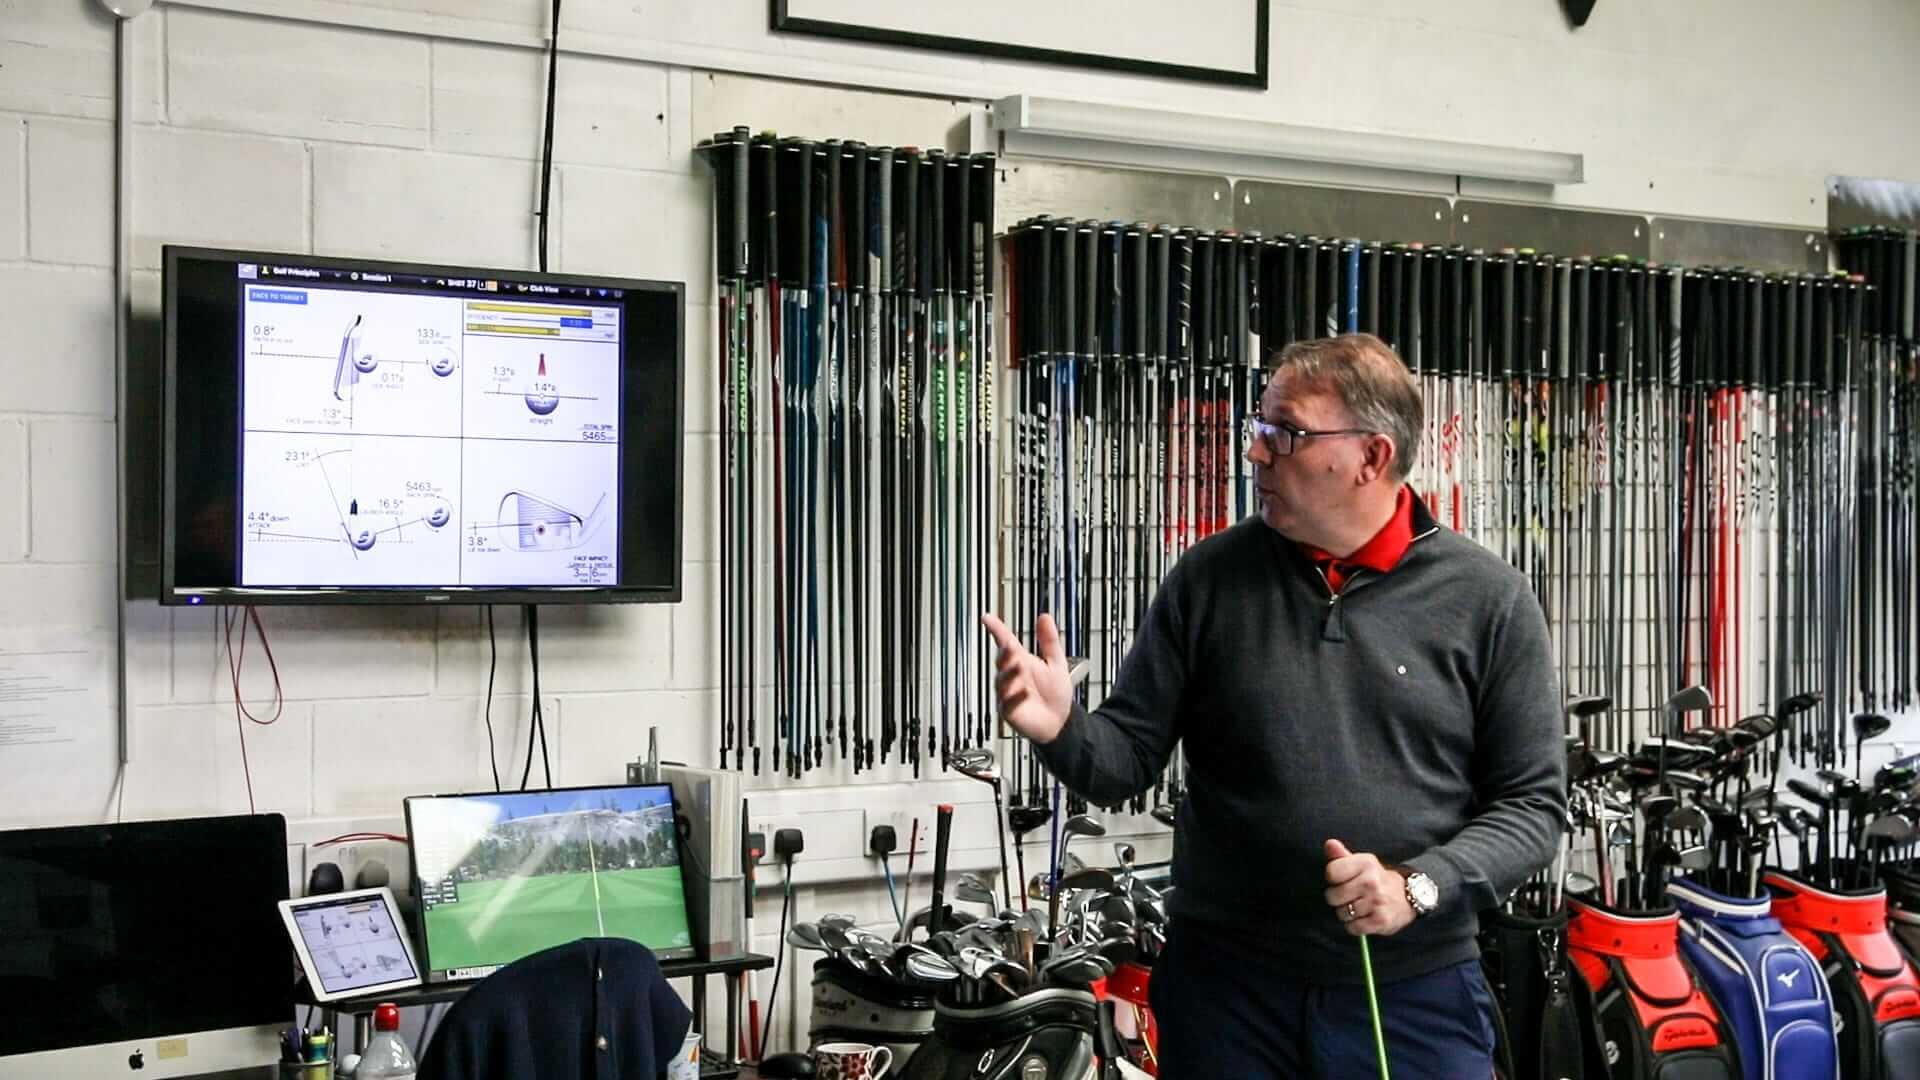 PGA installs a Foresight simulator